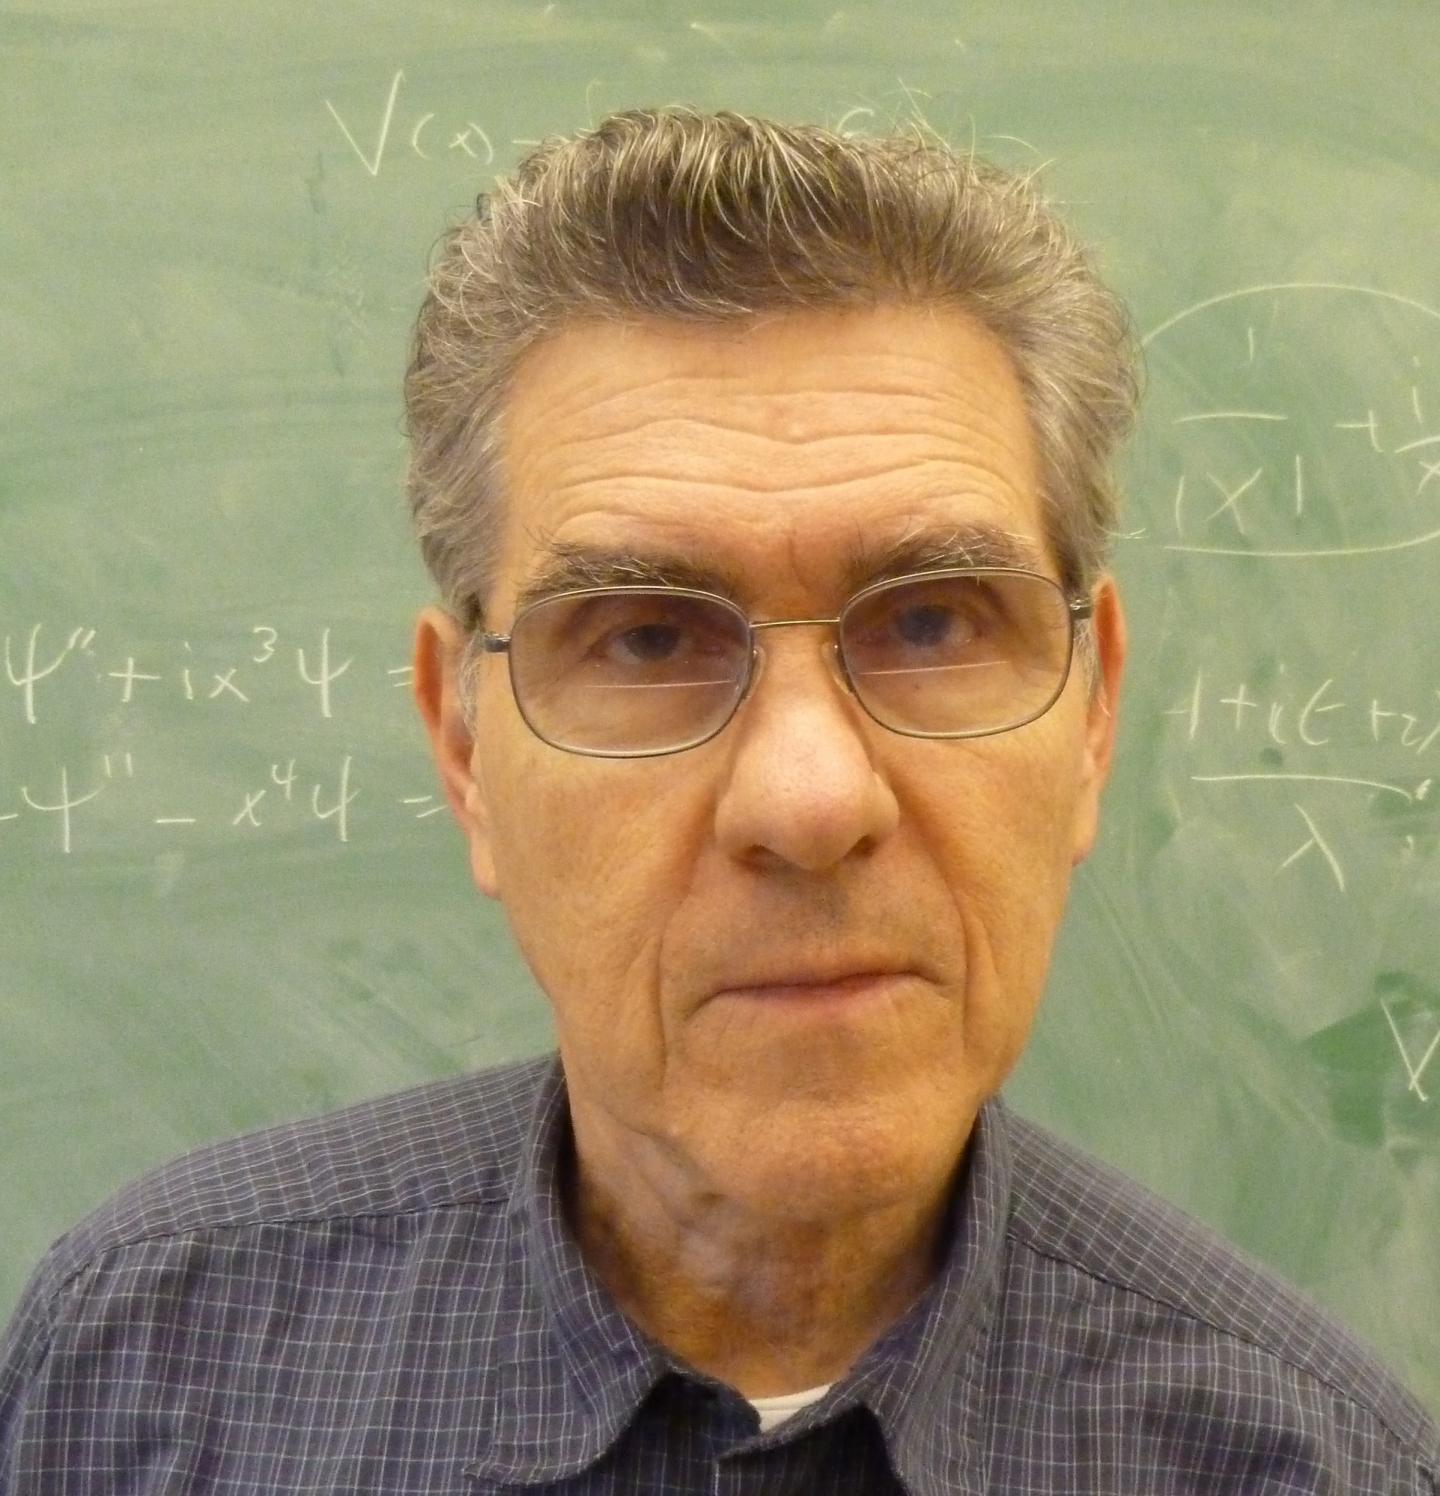 Quantum physicist Carl M. Bender wins 2017 Dannie Heineman Prize for Mathematical Physics